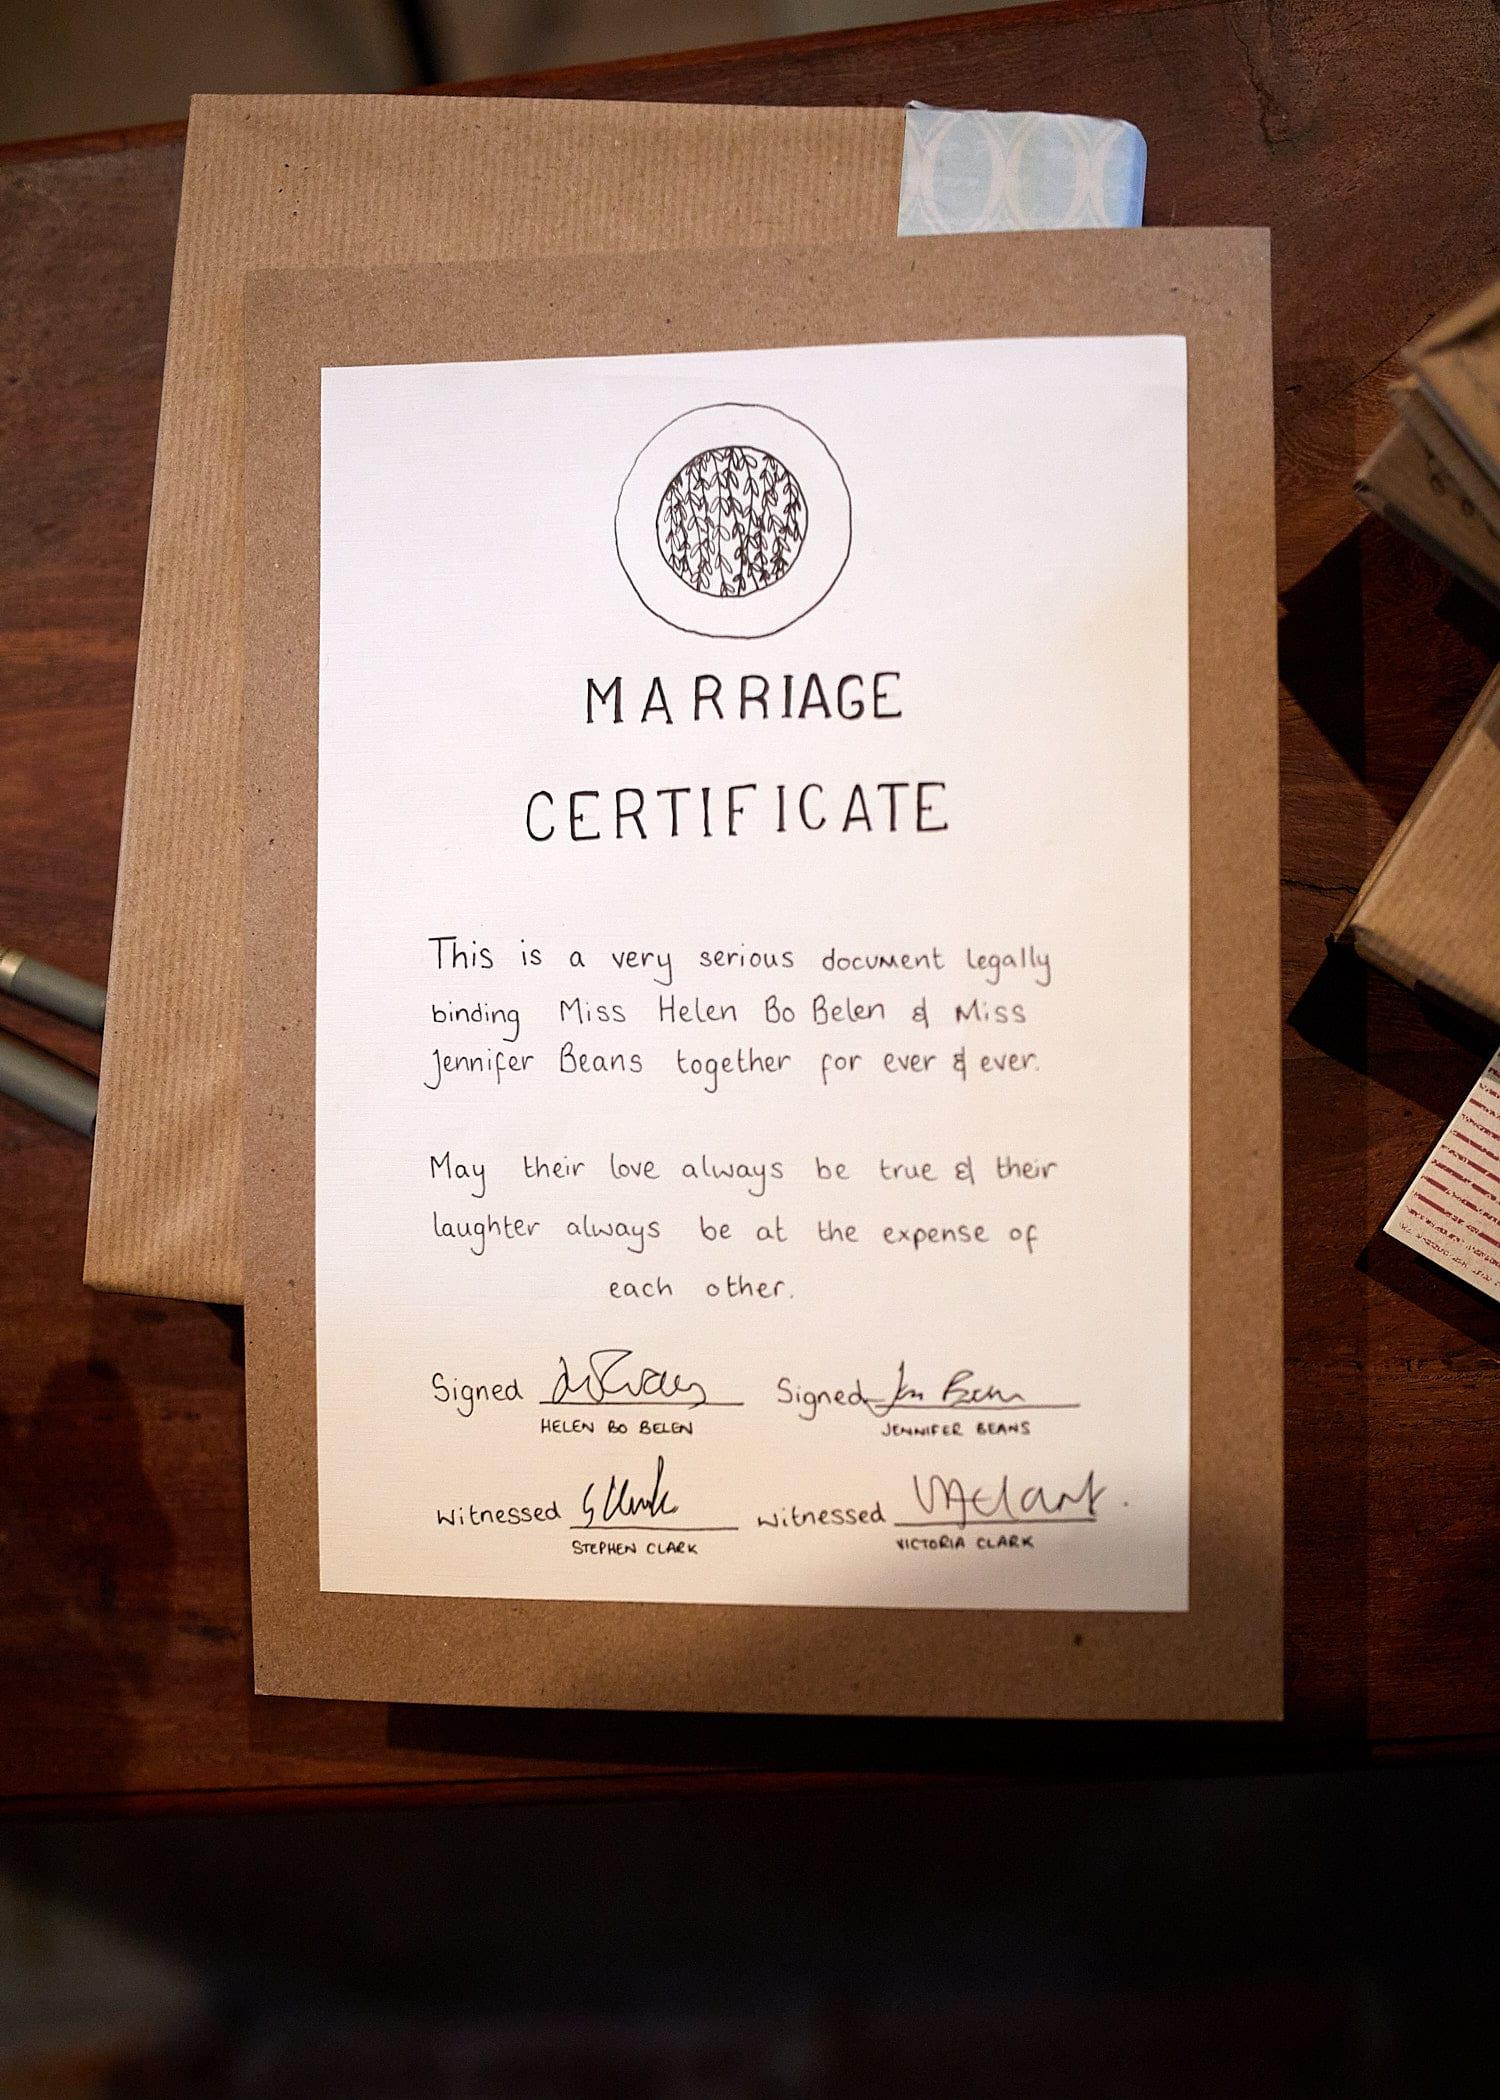 A same sex marriage certificate